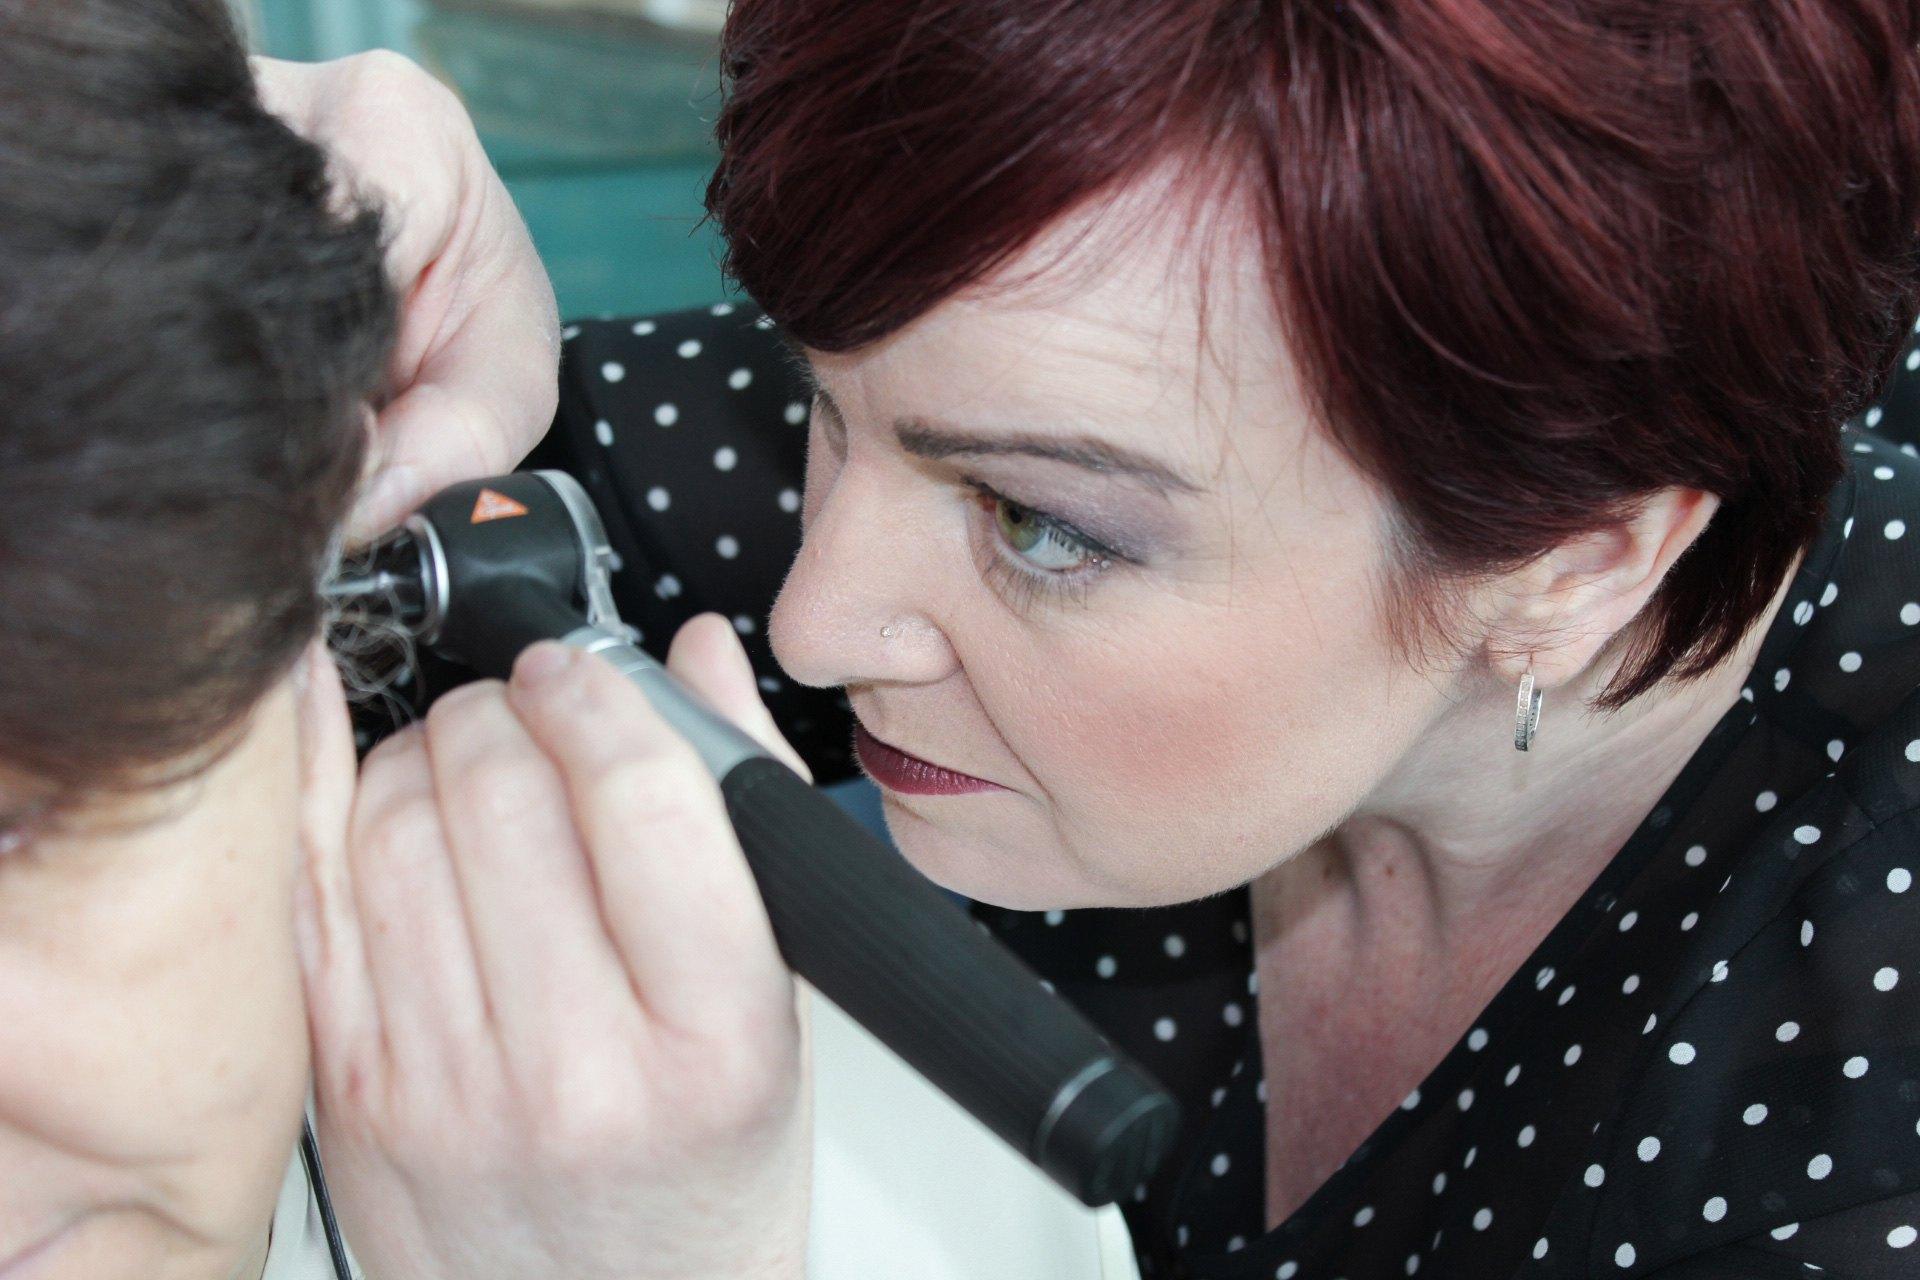 Hearing Test - Video Otoscopy